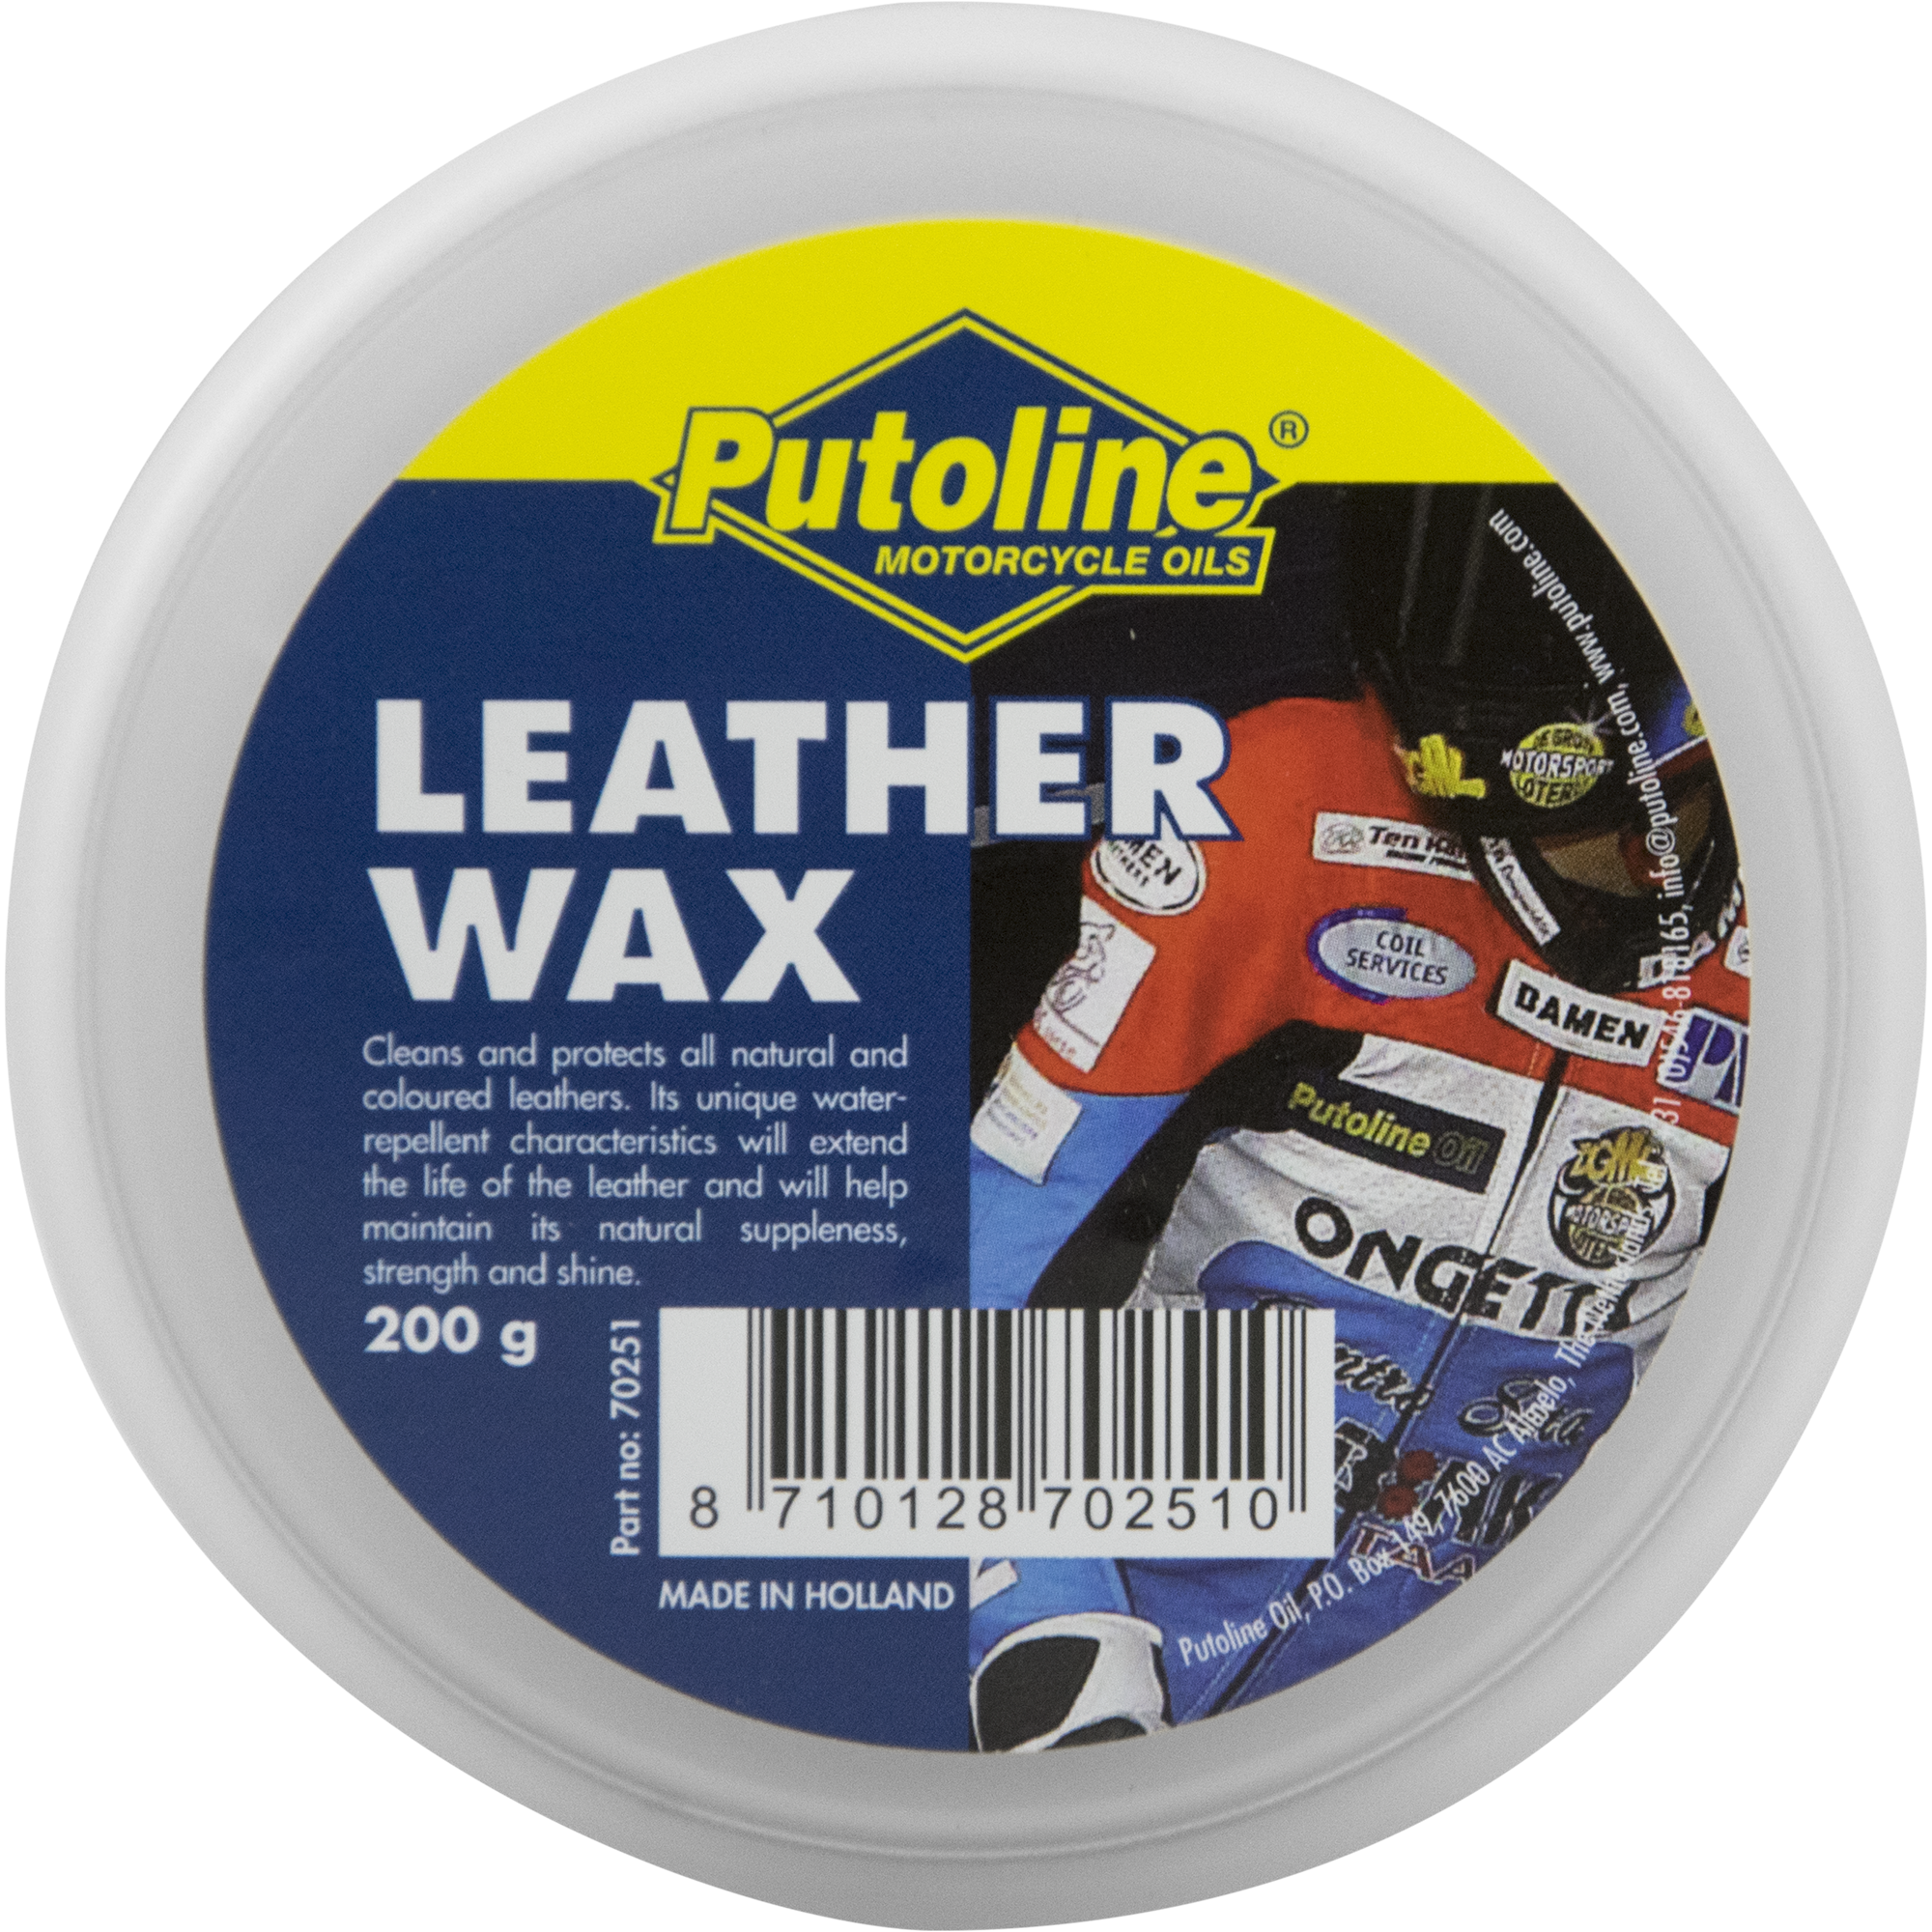 Putoline Leather Wax 200g